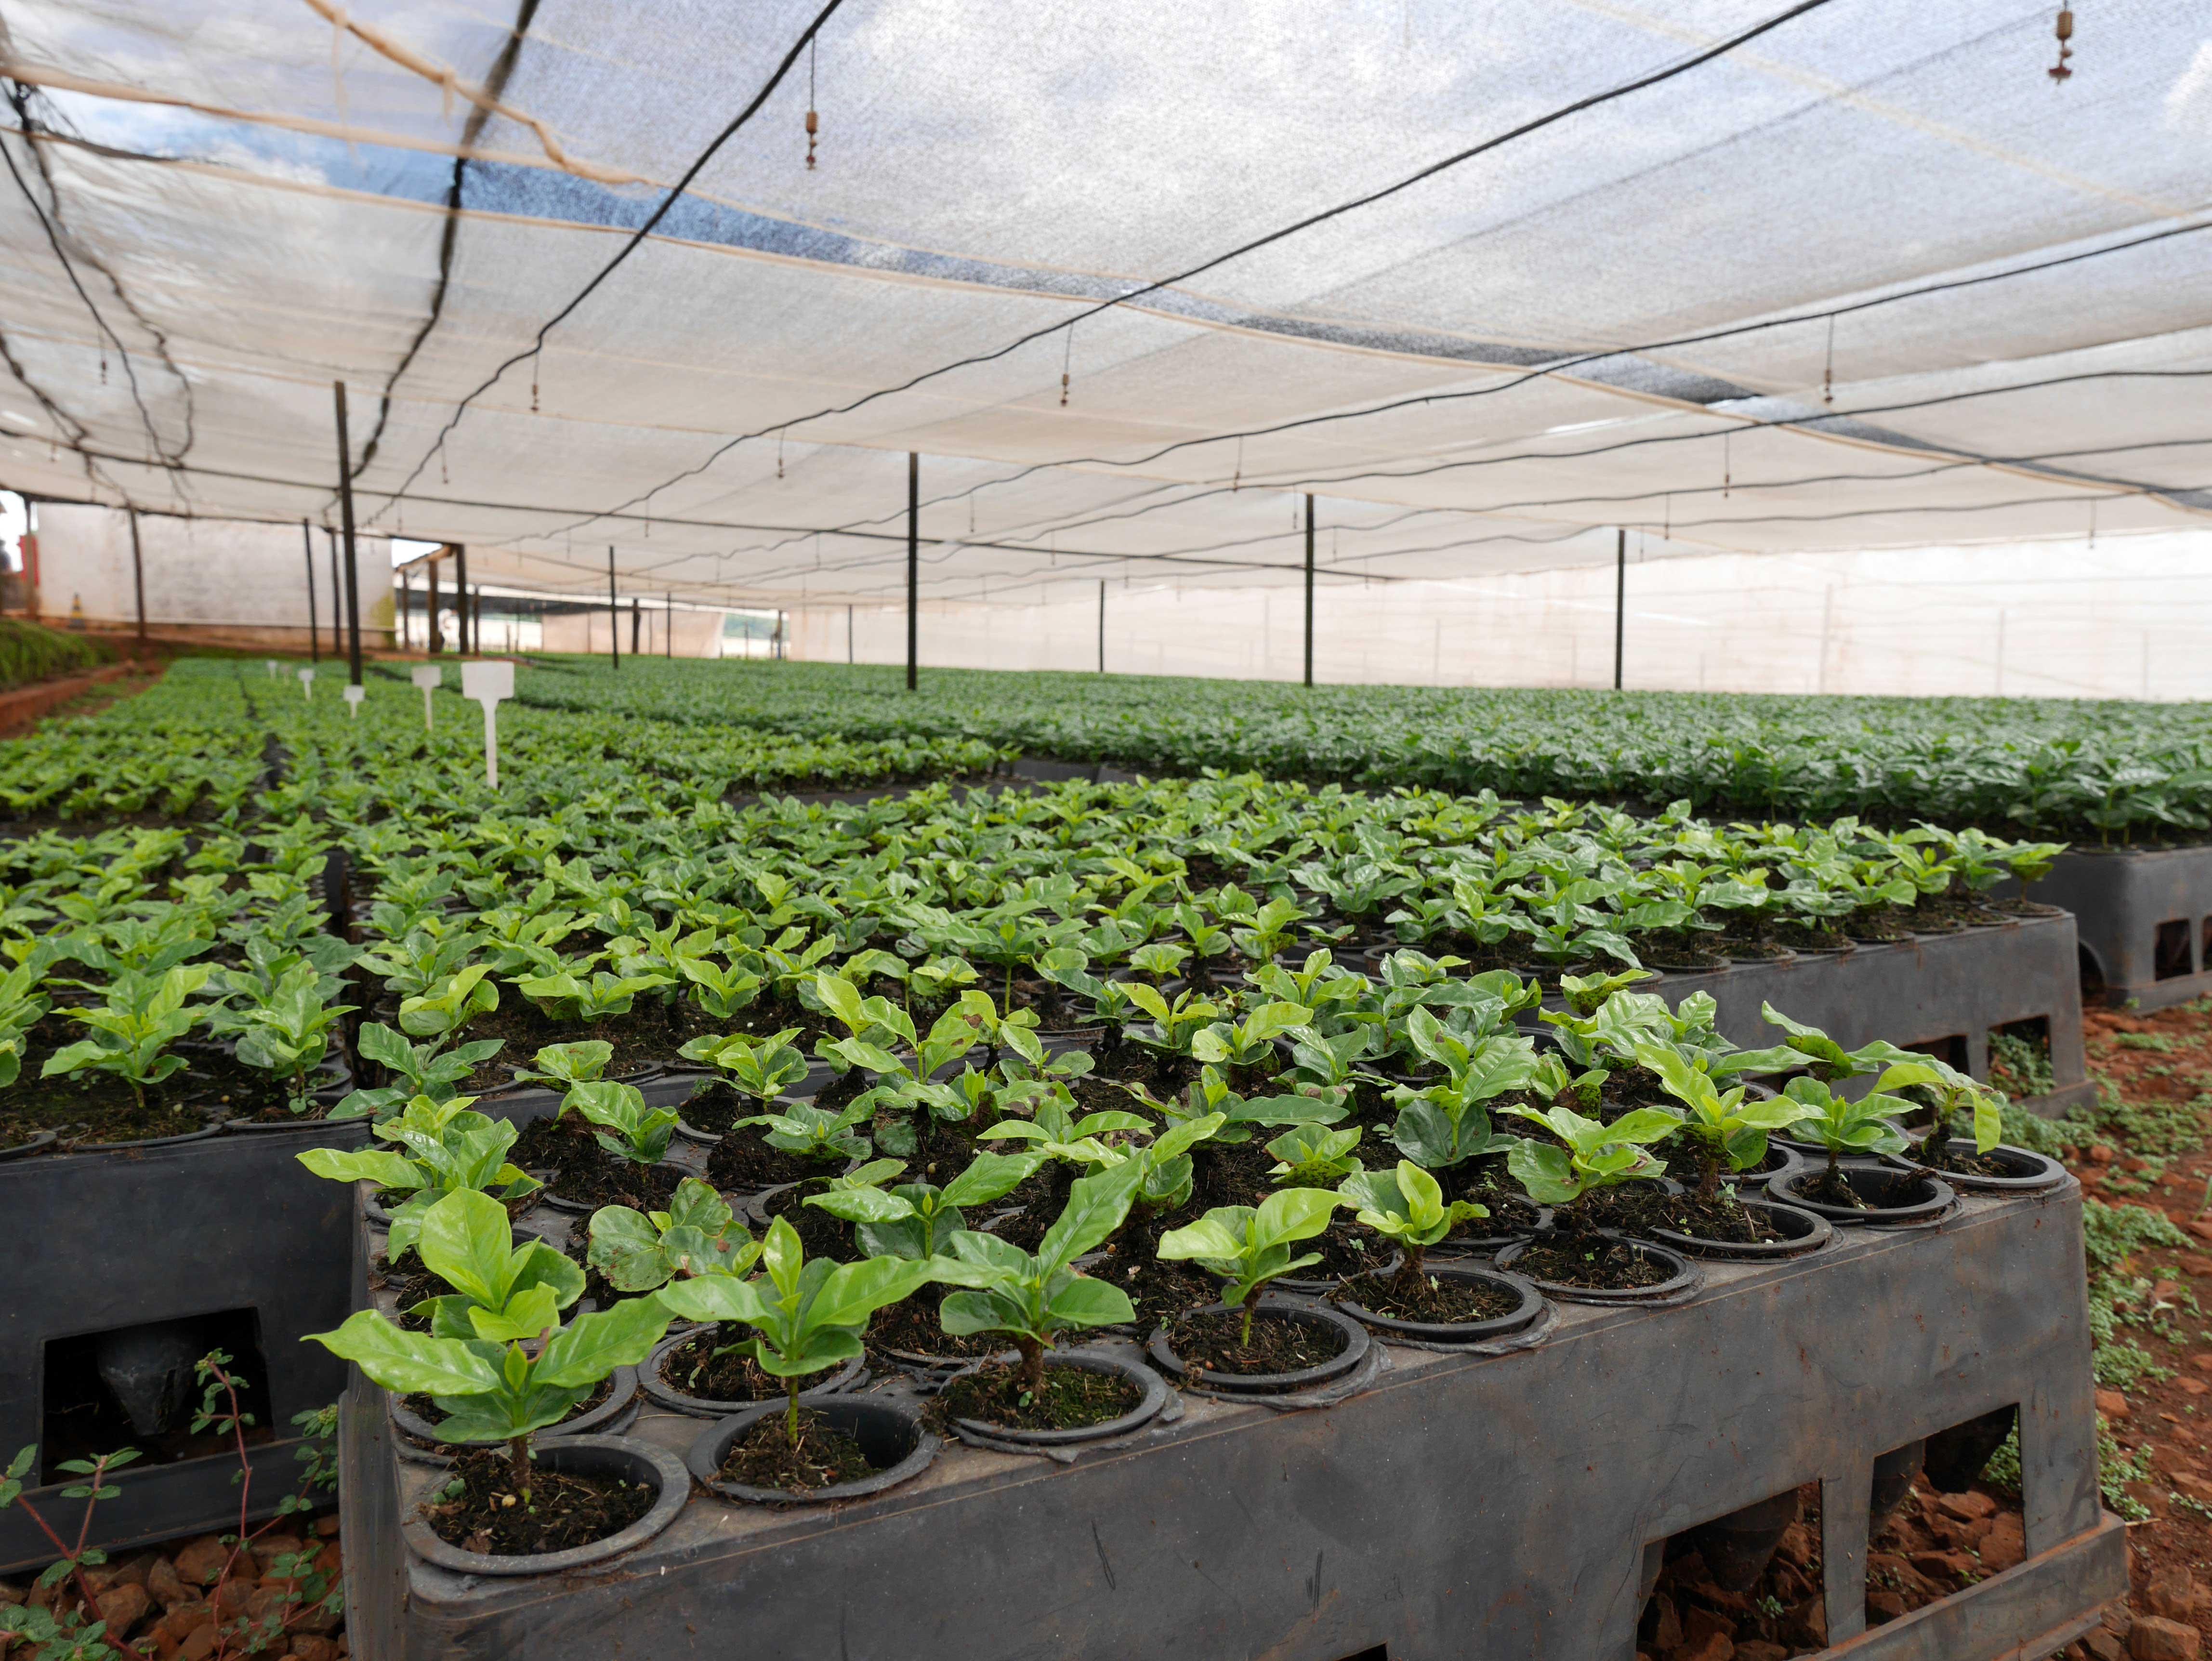 Fazenda-Bela-Epoca-nursery-2